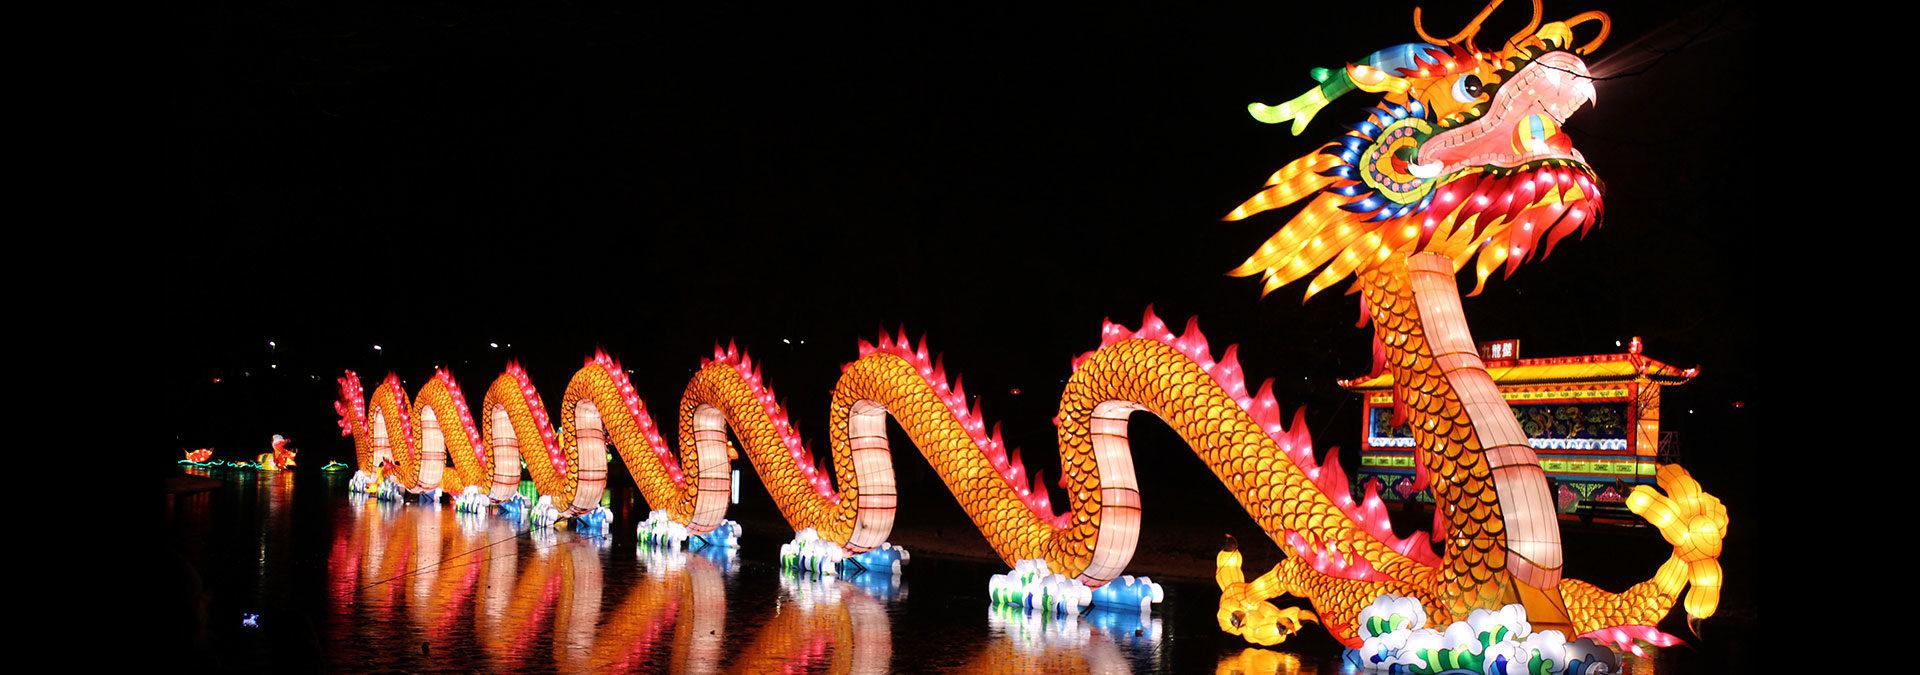 Dragon Lights Festival Reno